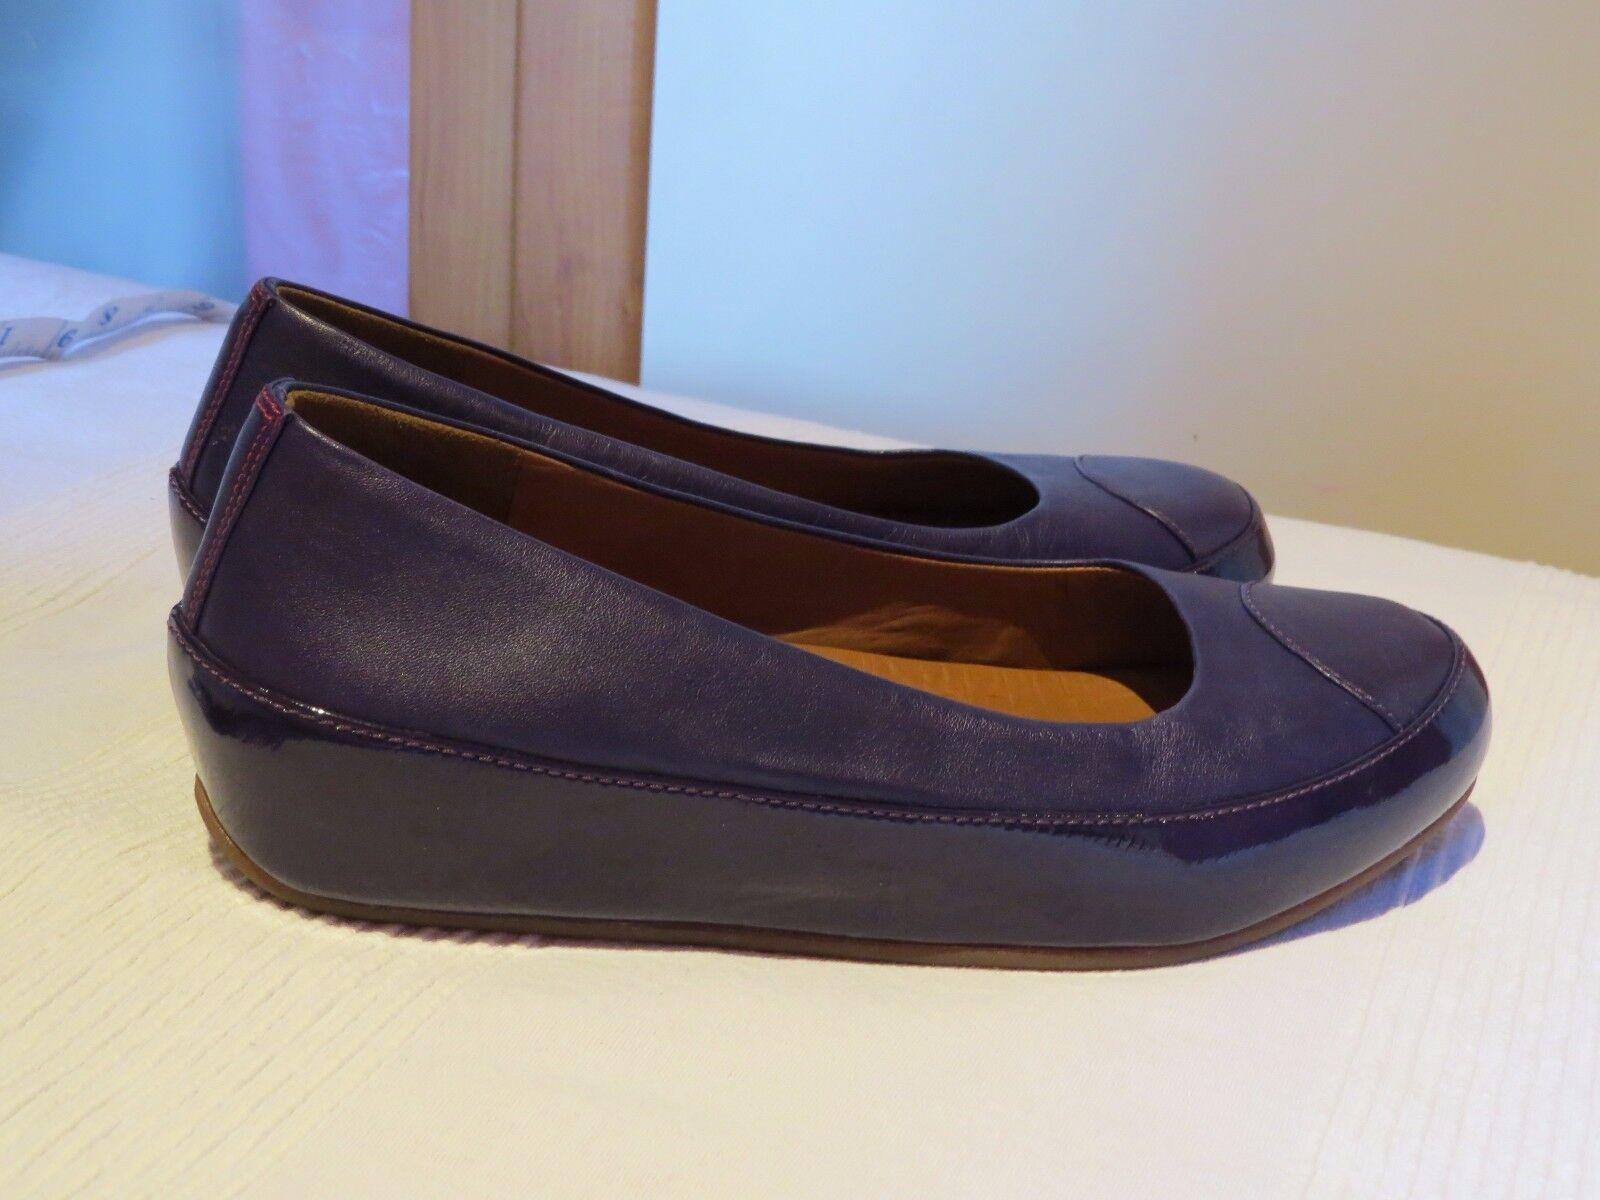 FITFLOP™ DUE PURPLE LEATHER PLATFORM BALLERINA PUMPS Schuhe UK 6 EUR 39